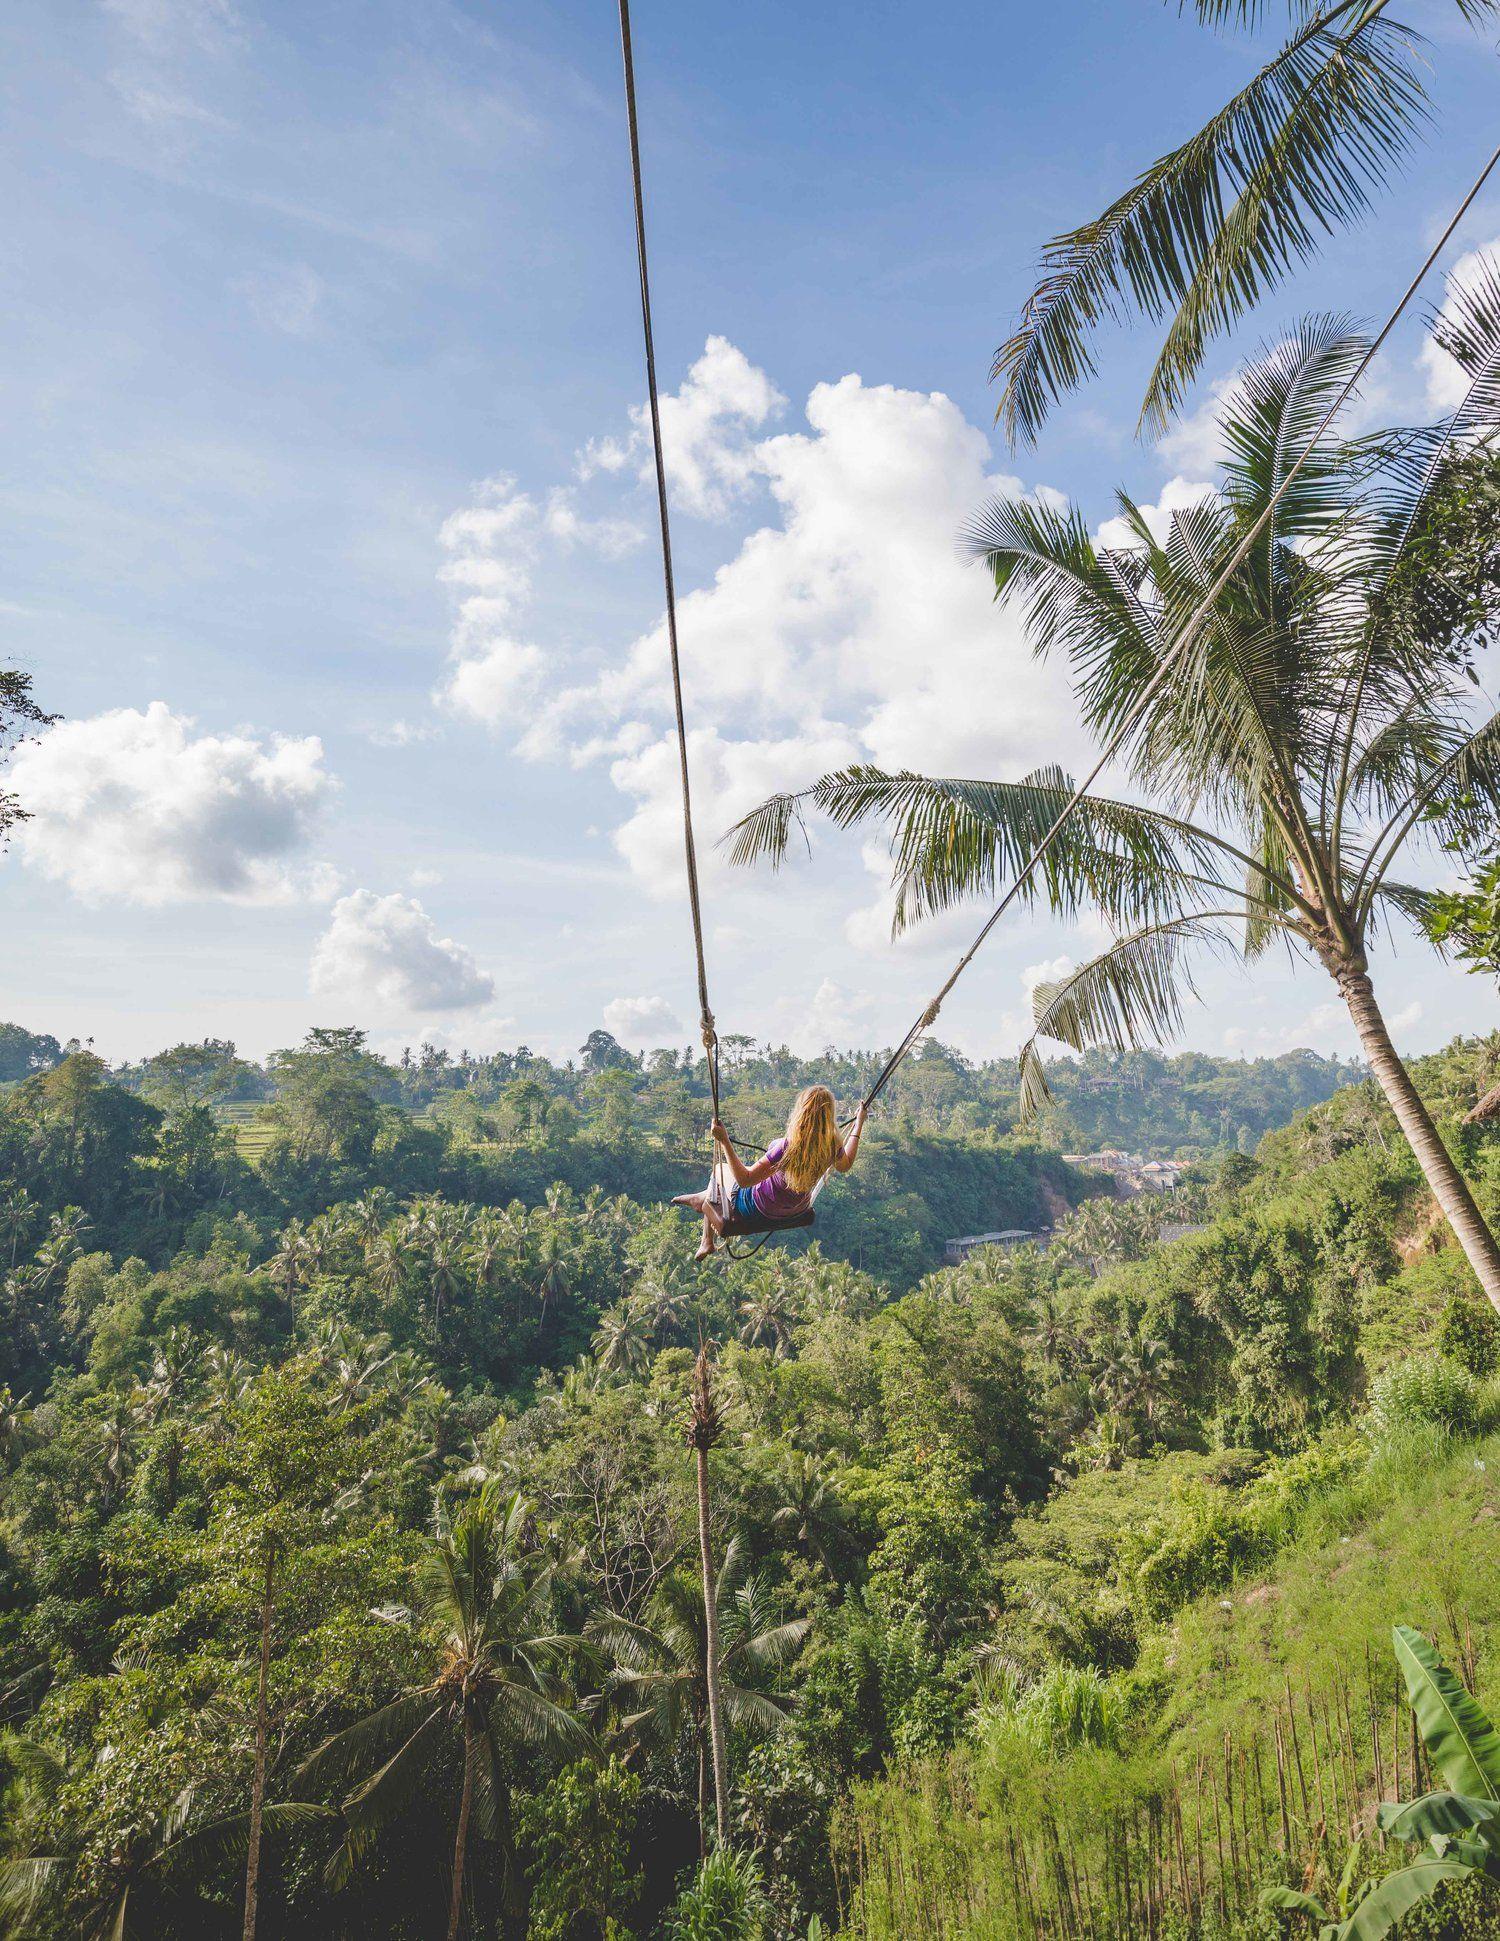 The Bali Swing Ubud Everything You Need To Know Ubud